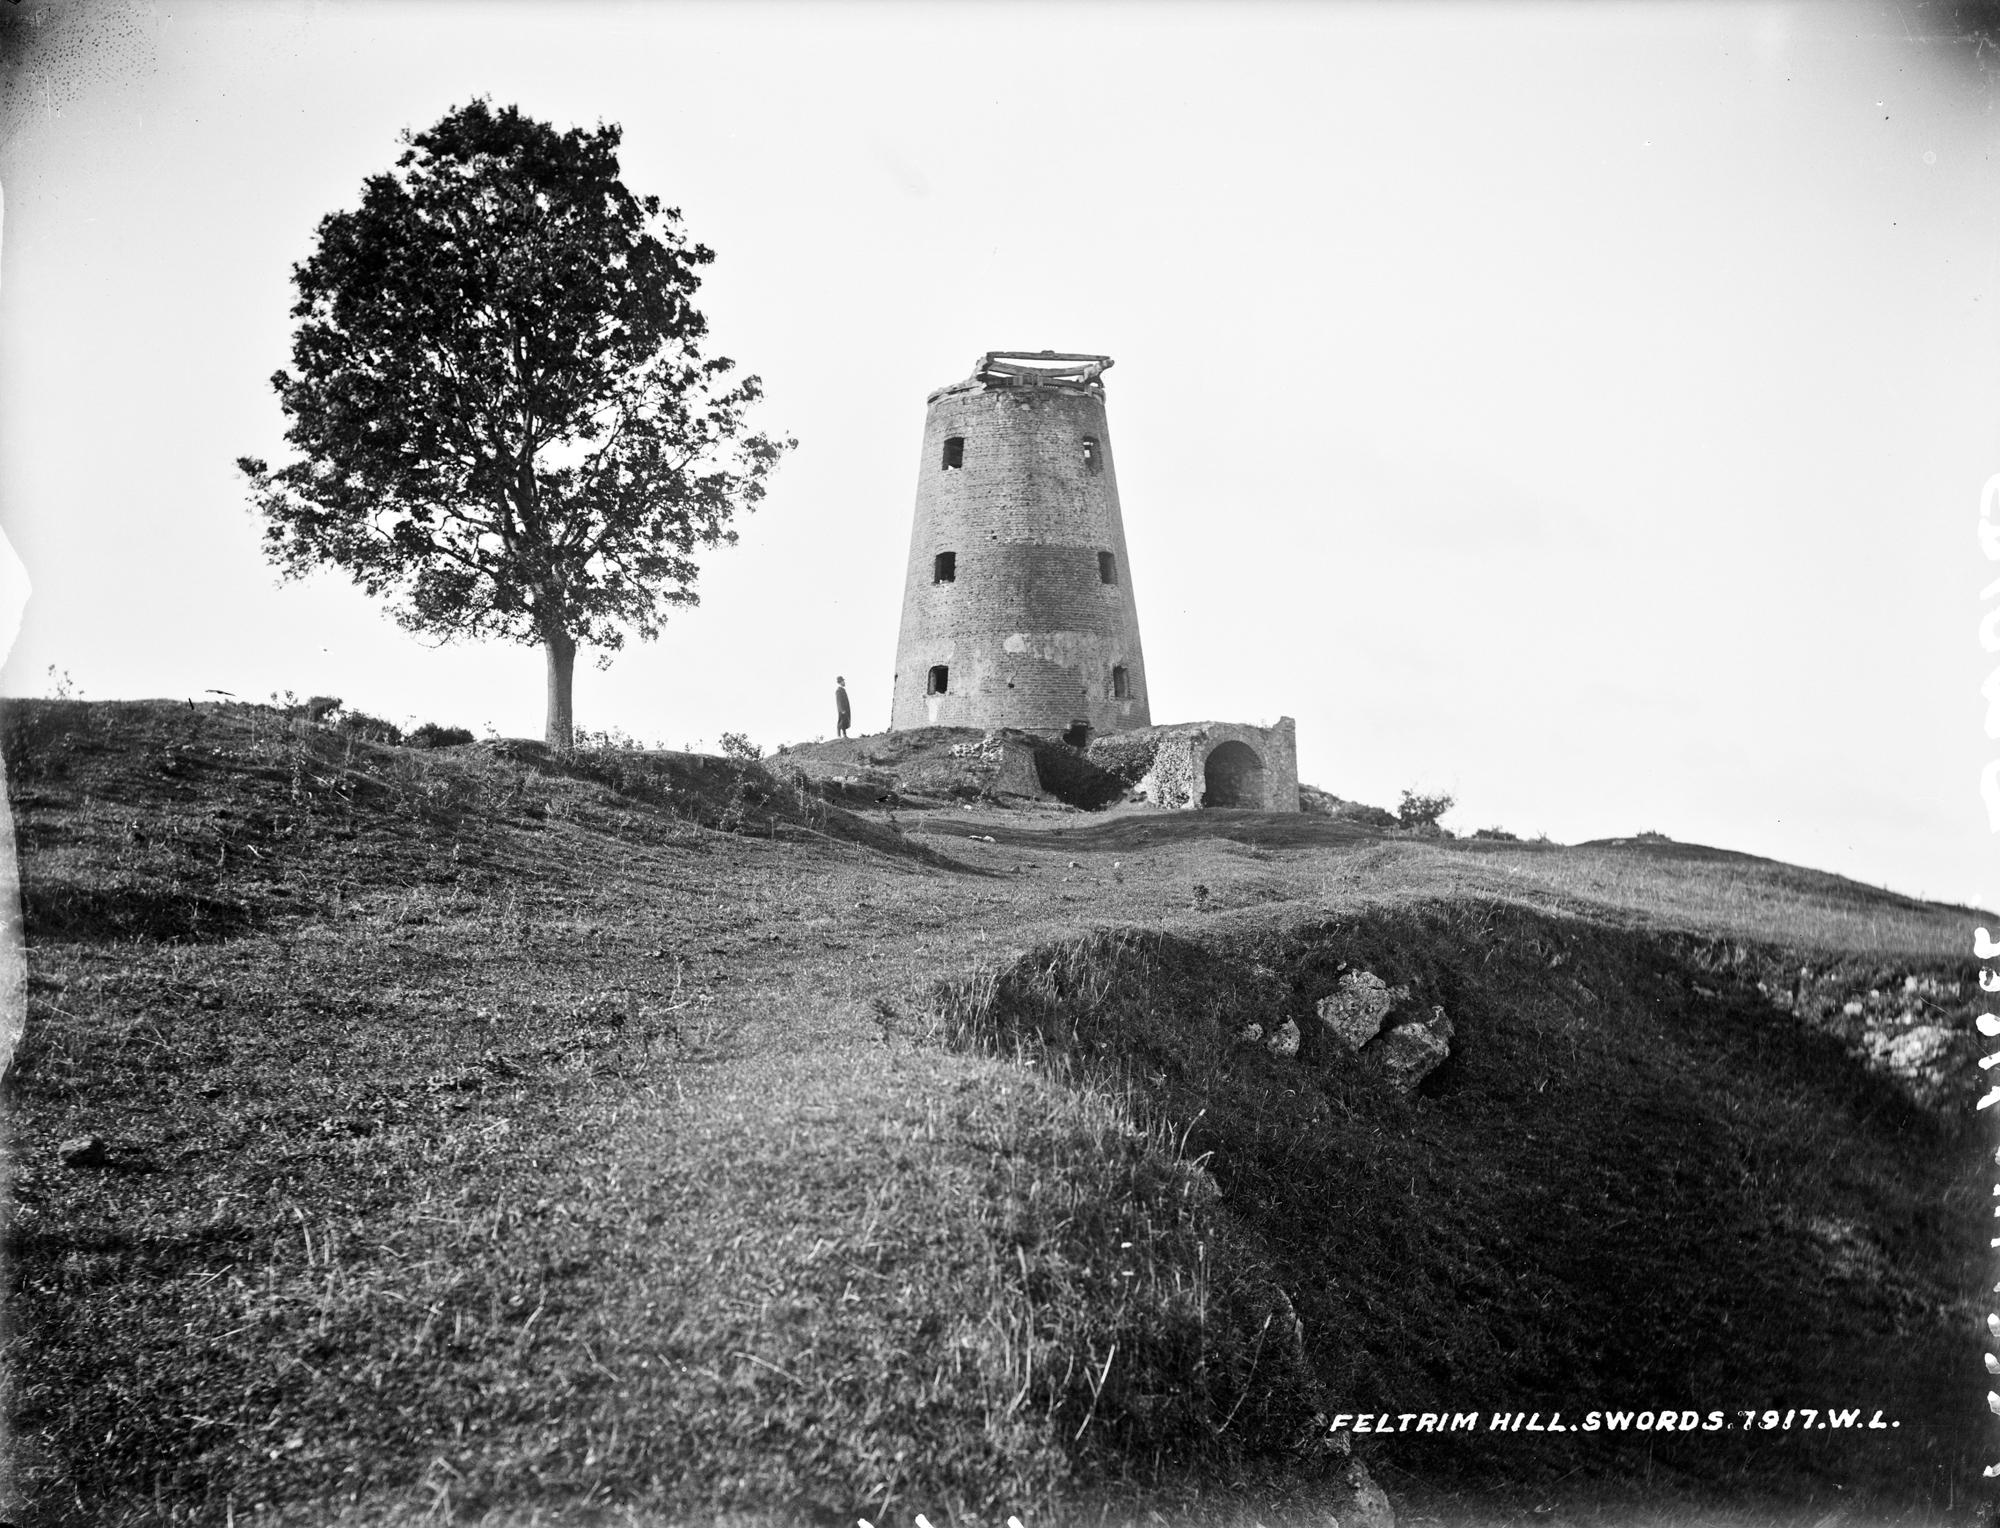 Feltrim Hill, Swords, Co. Dublin